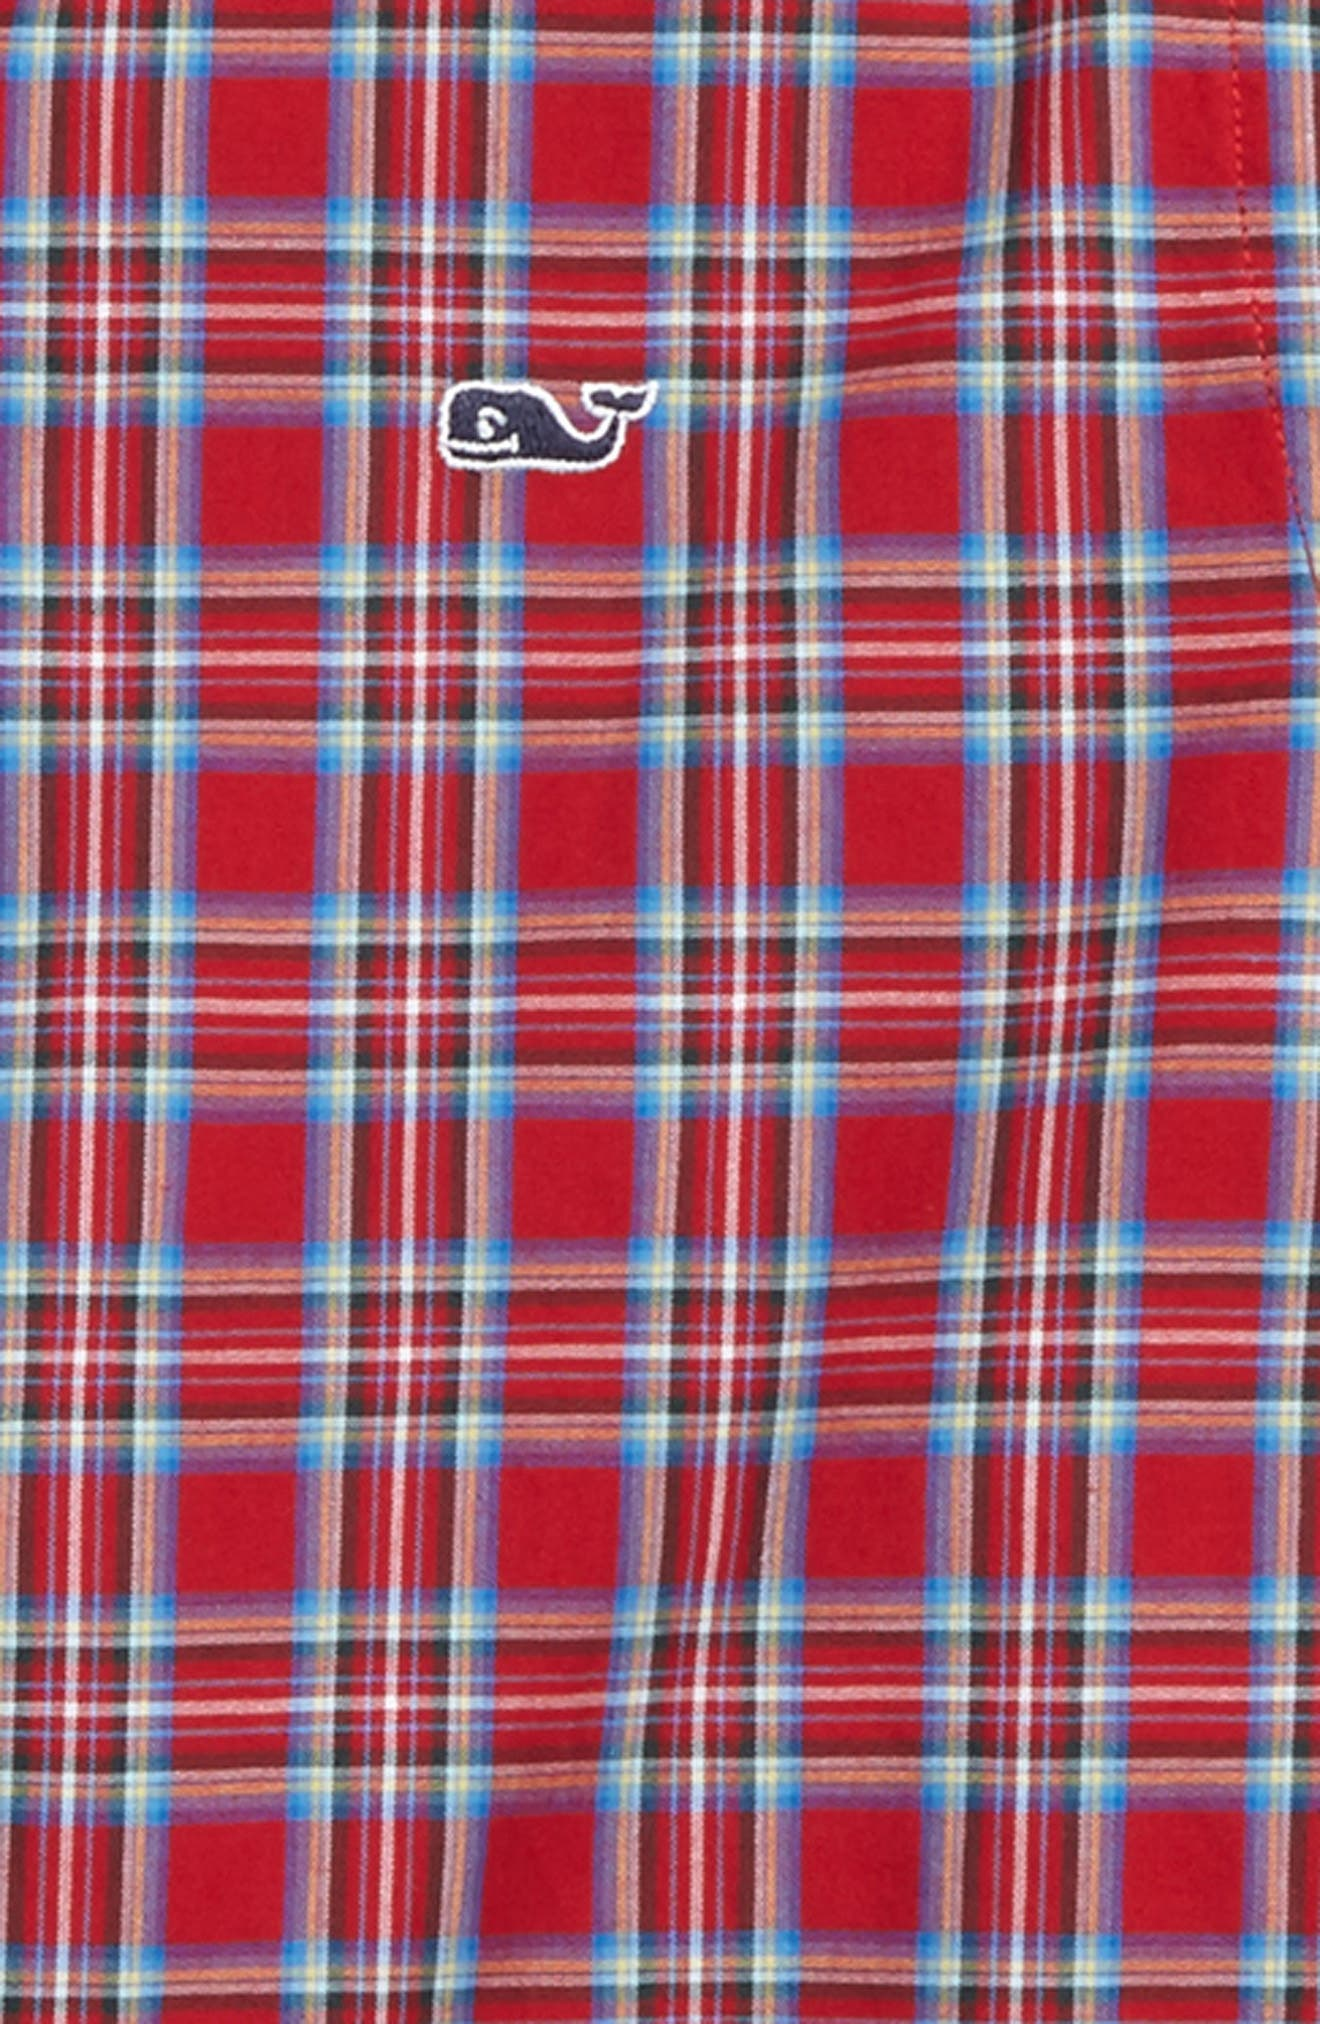 Riverton Plaid Whale Shirt,                             Alternate thumbnail 2, color,                             600